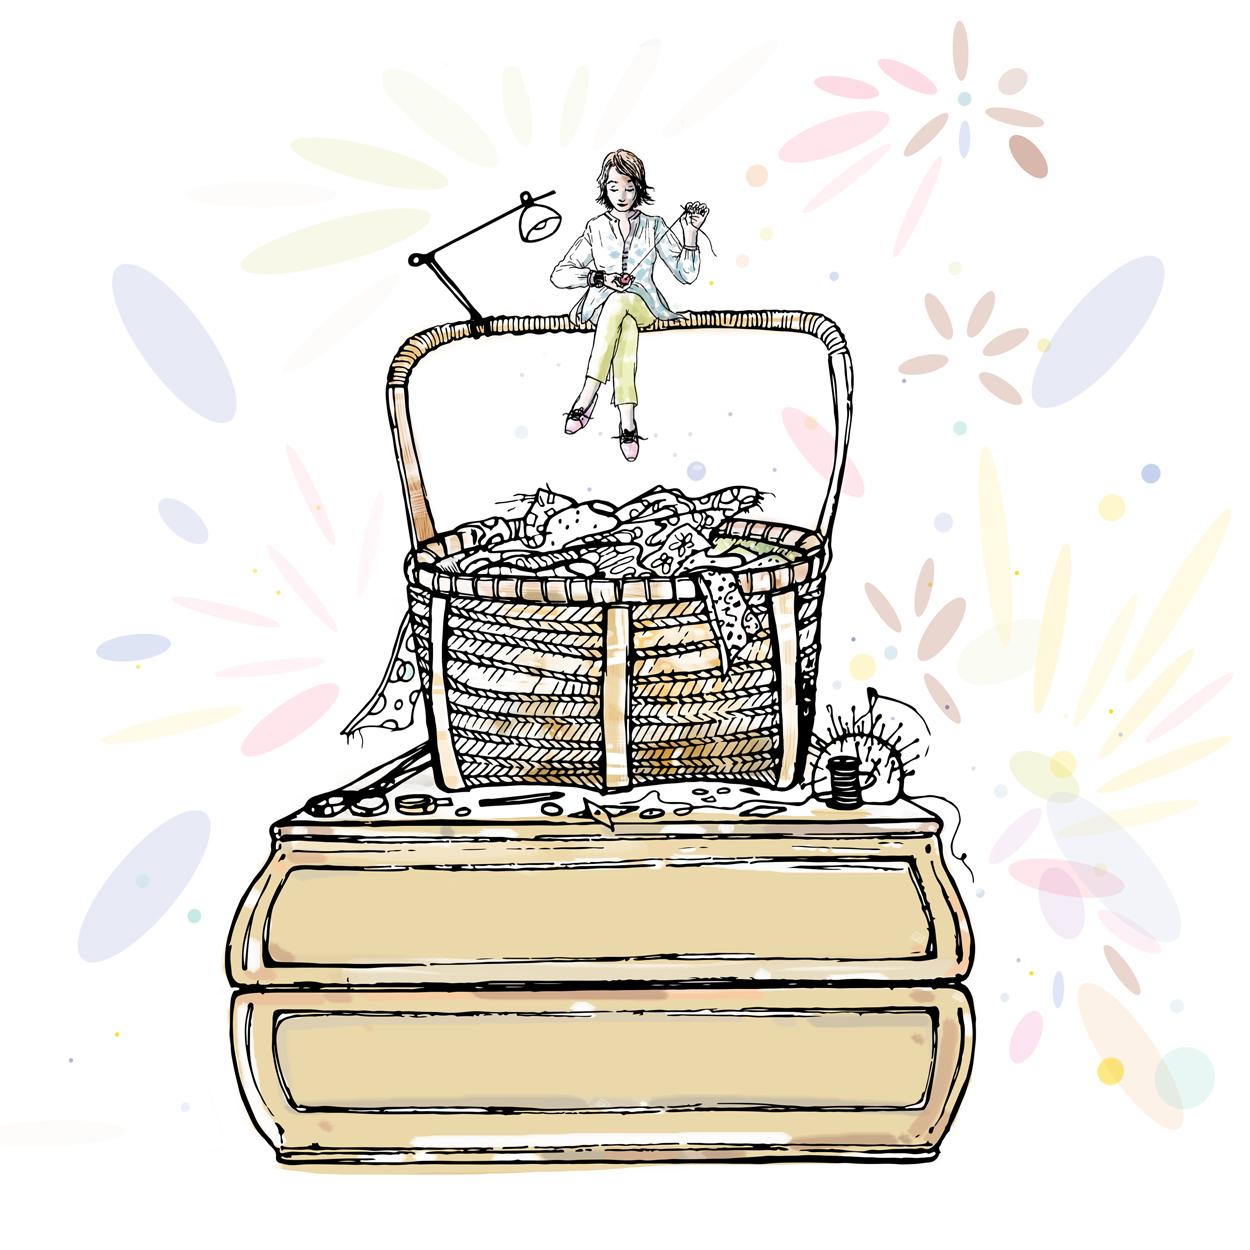 Sur-mesure-Creation--bijoux-textiles-Valerie-Hangel